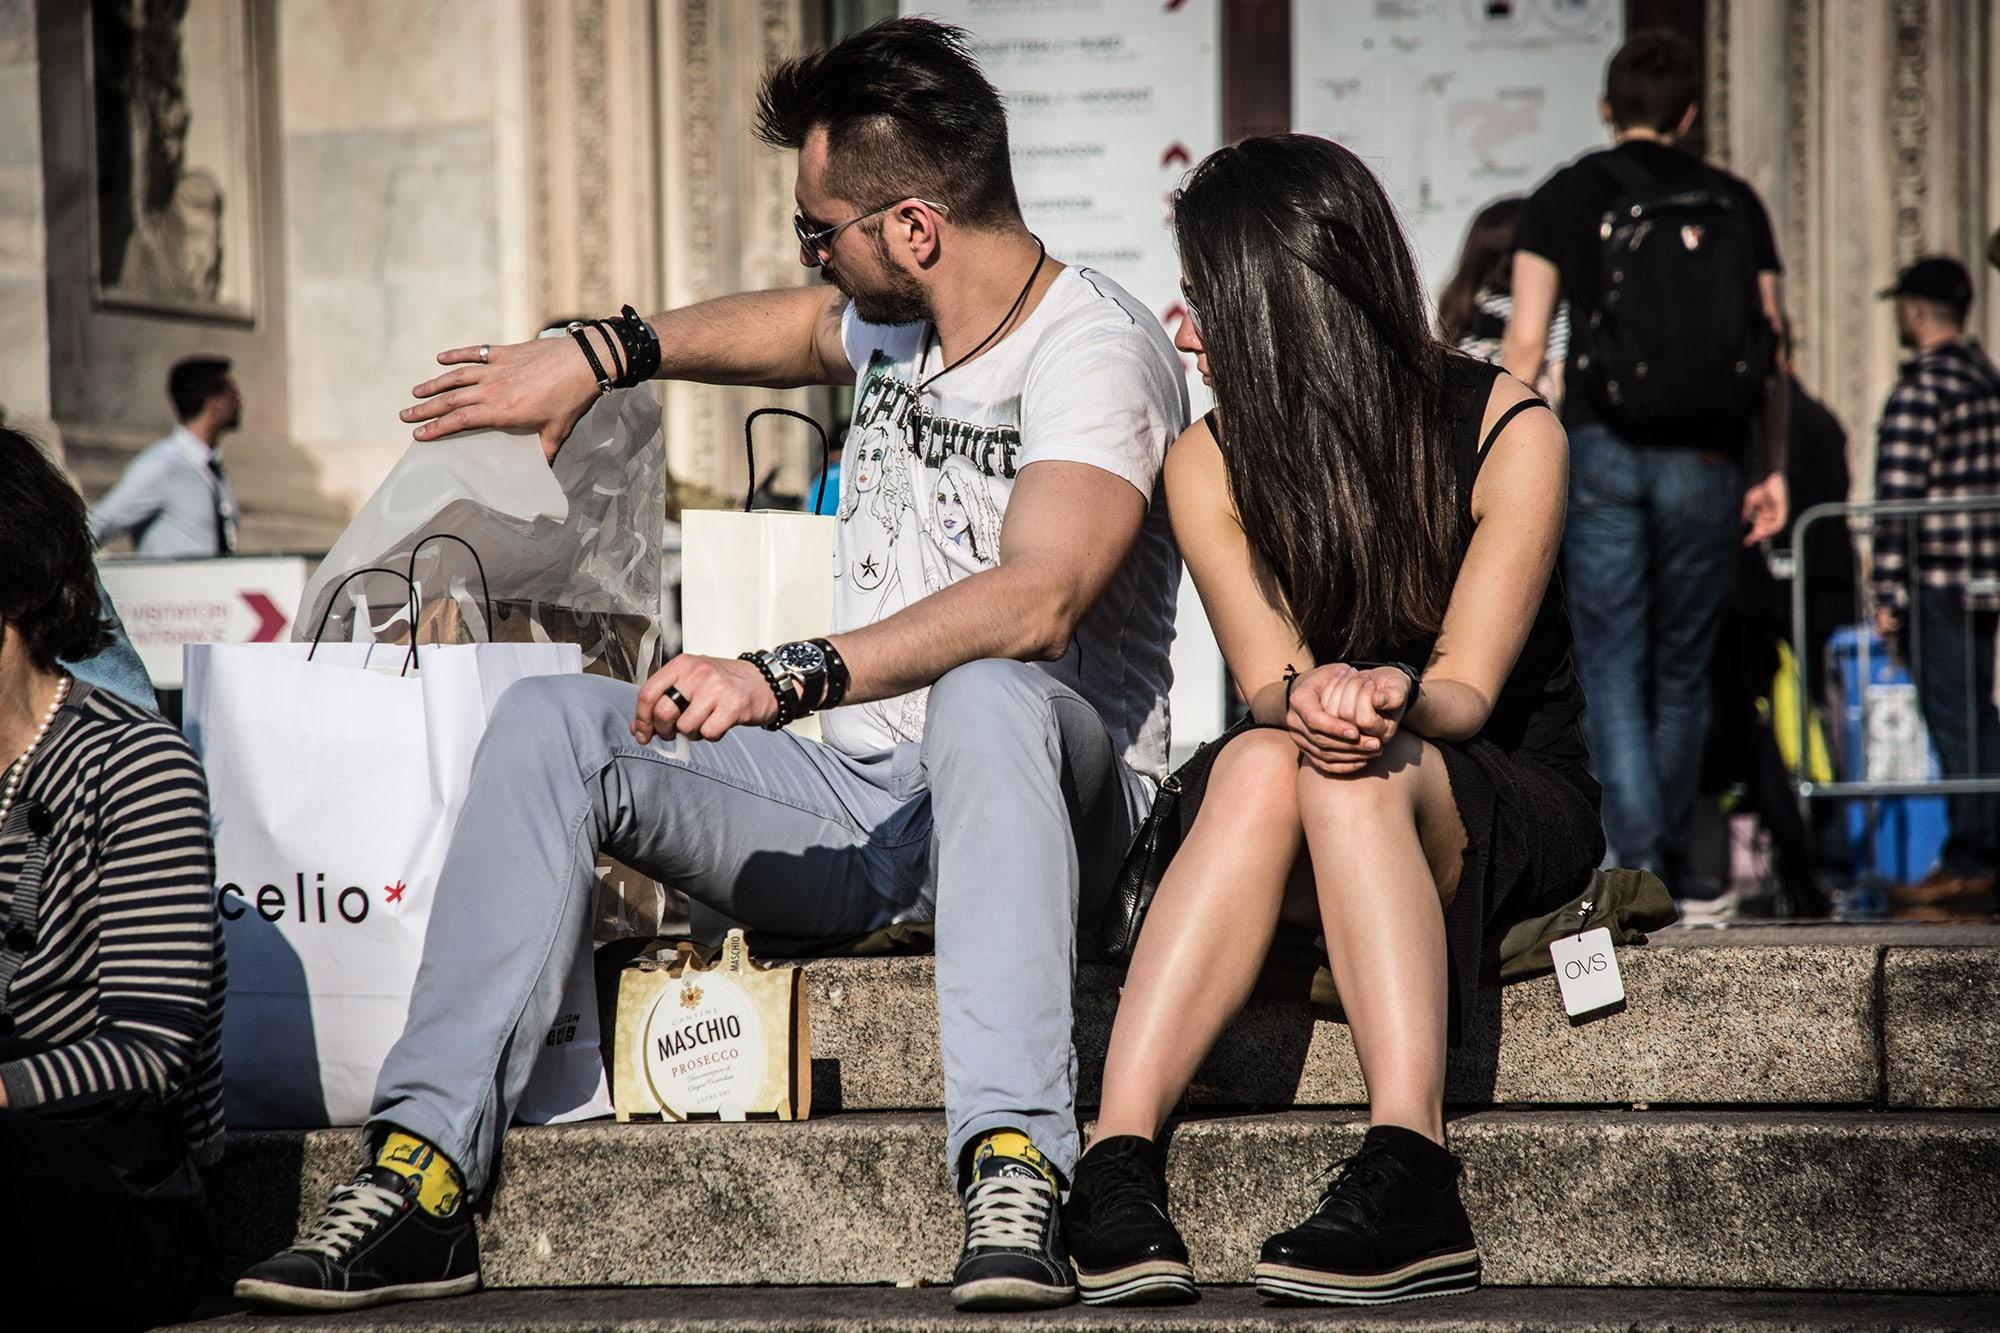 DSC 6180 min #общество Campari, wizzair, Брера, бутик, визы, Грузия, Дуомо, Италия, Кутаиси, Ла Скала, Милан, мода, шоппинг